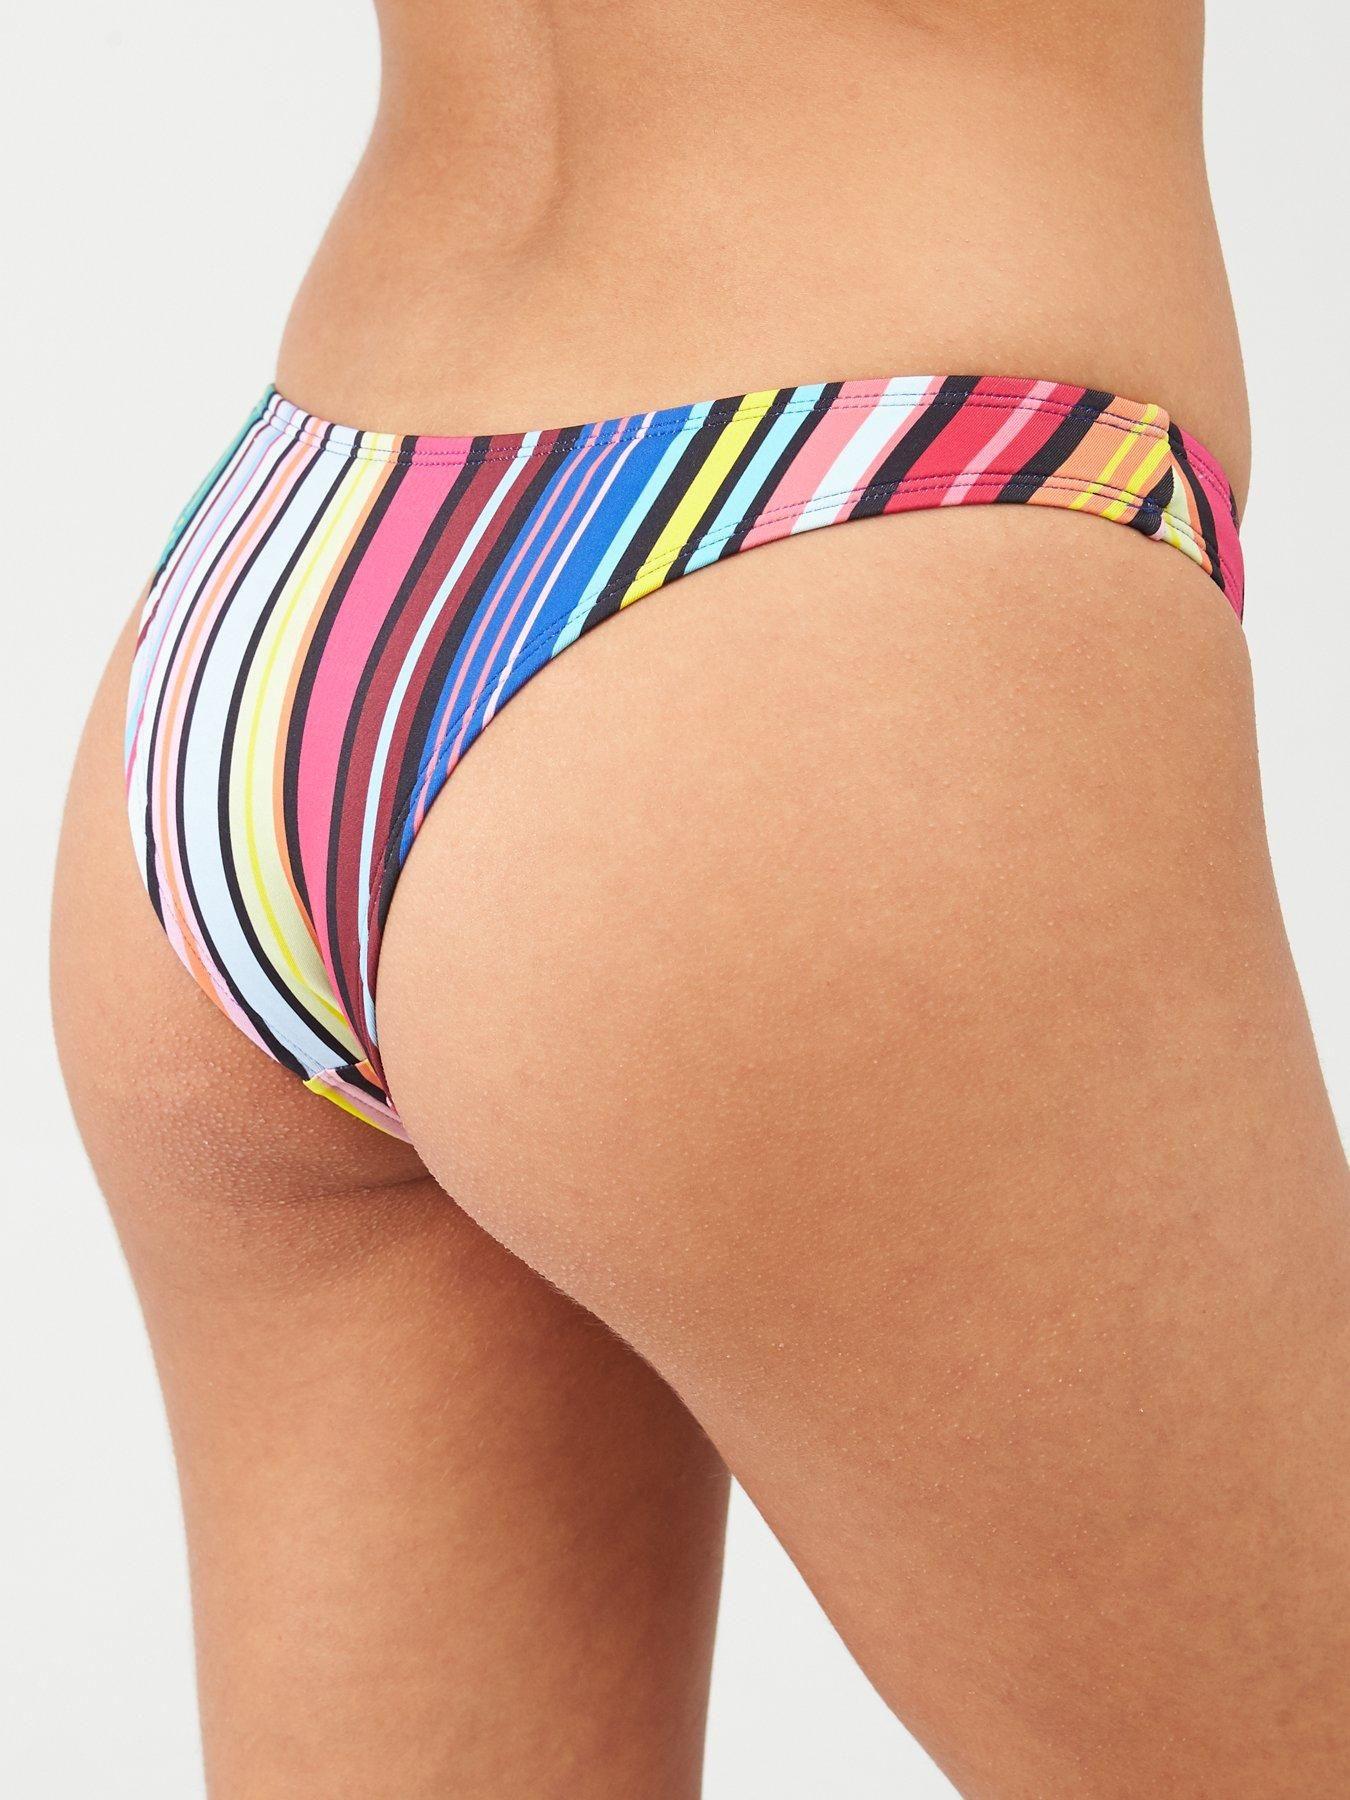 Dorina Tulum Brazilian Bikini Brief, Green, Size 8, Women – Green – 8